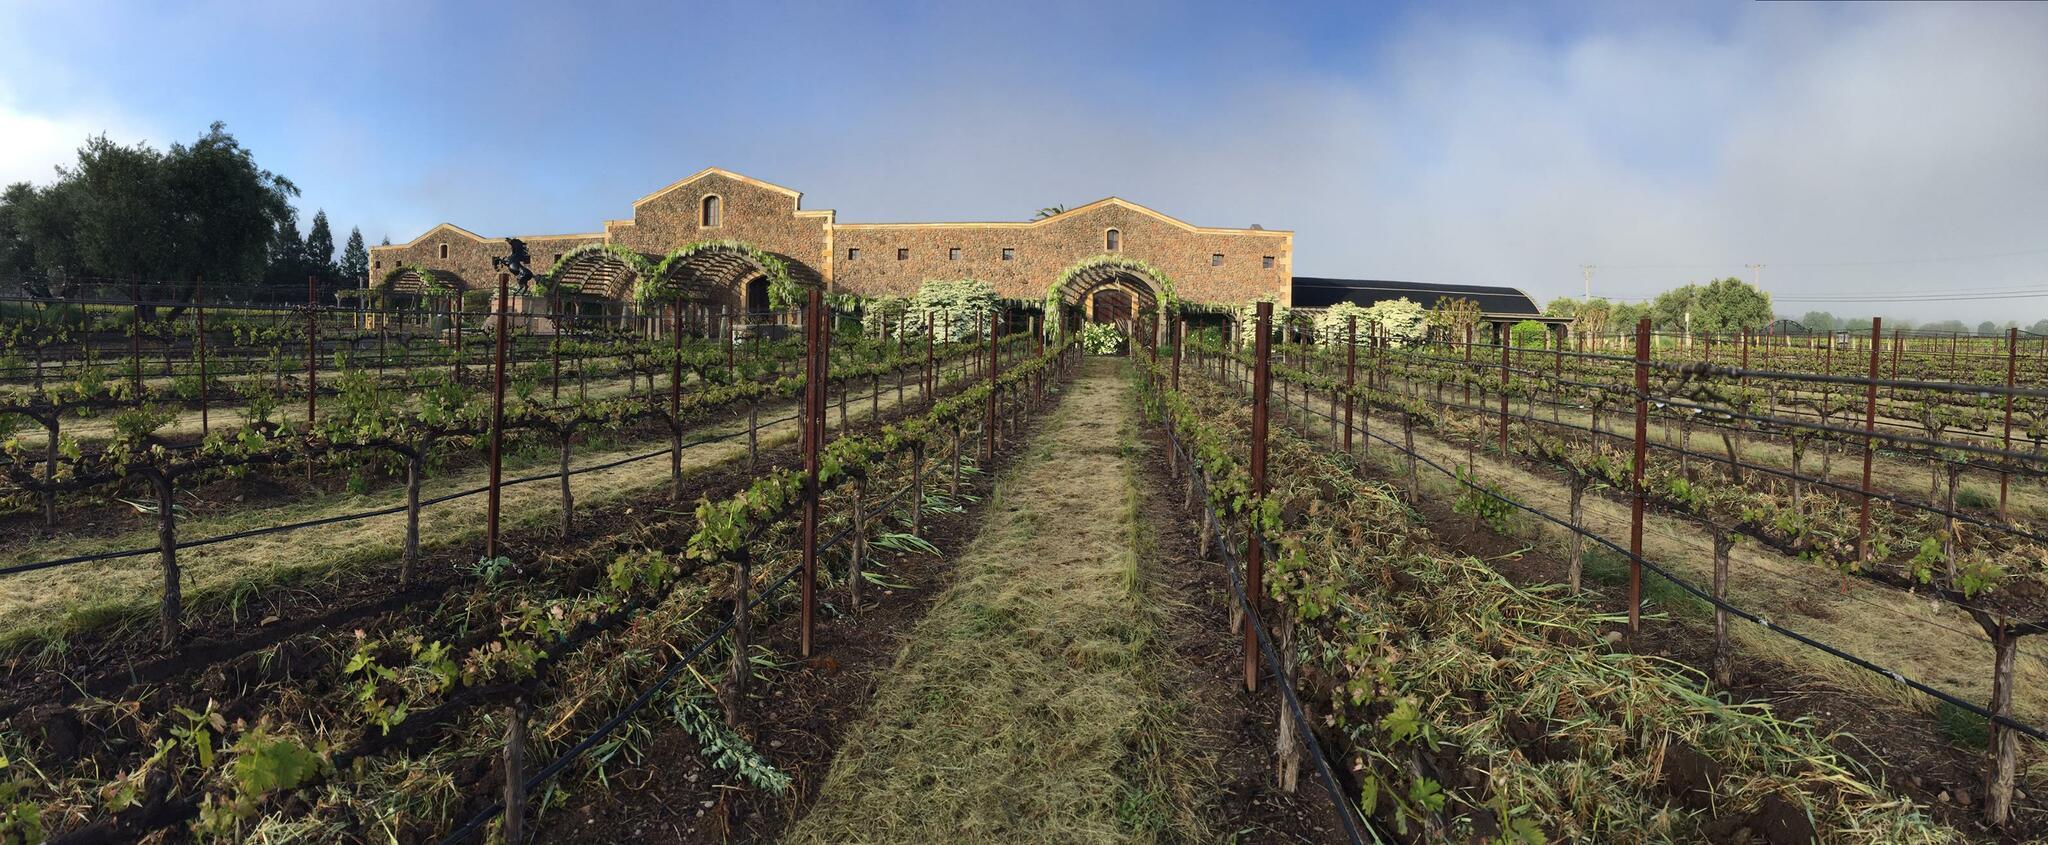 Black Stallion Estate Winery Cover Image